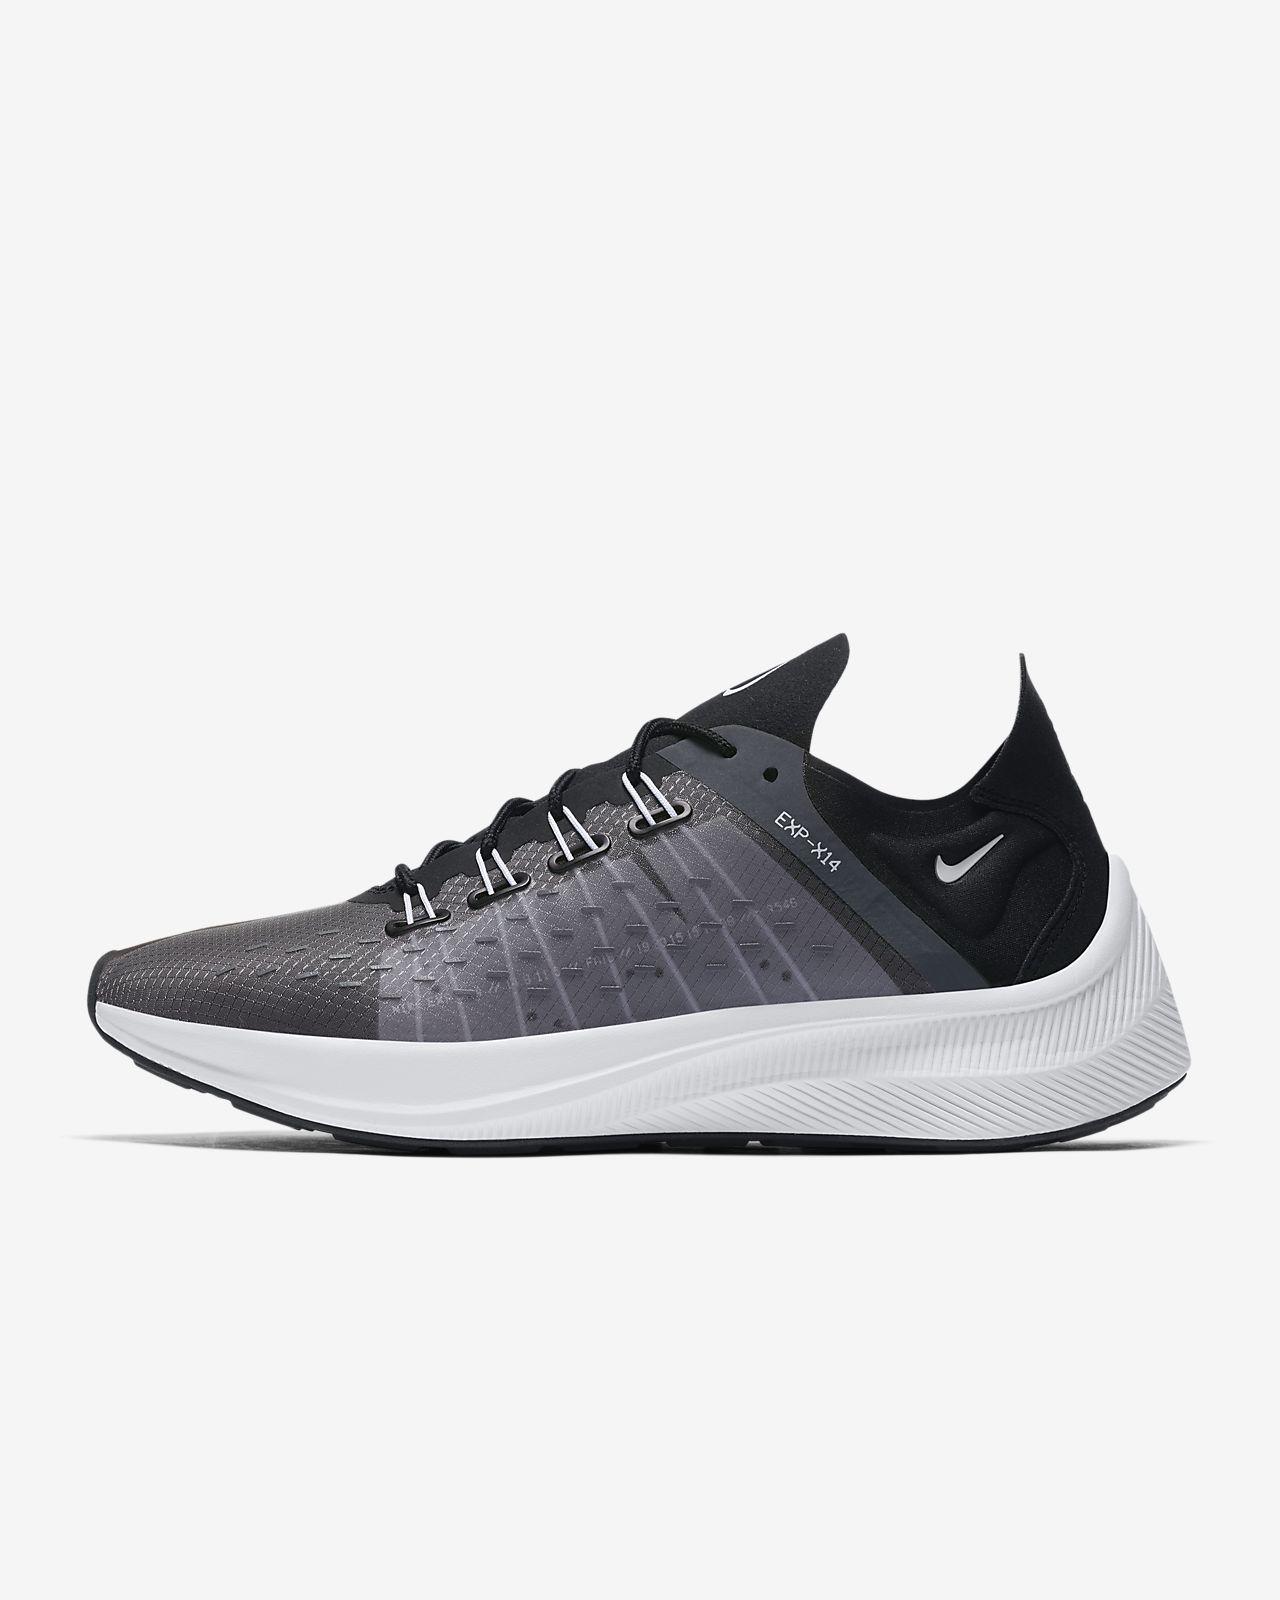 san francisco f0811 8cd2e ... Nike EXP-X14-sko til kvinder